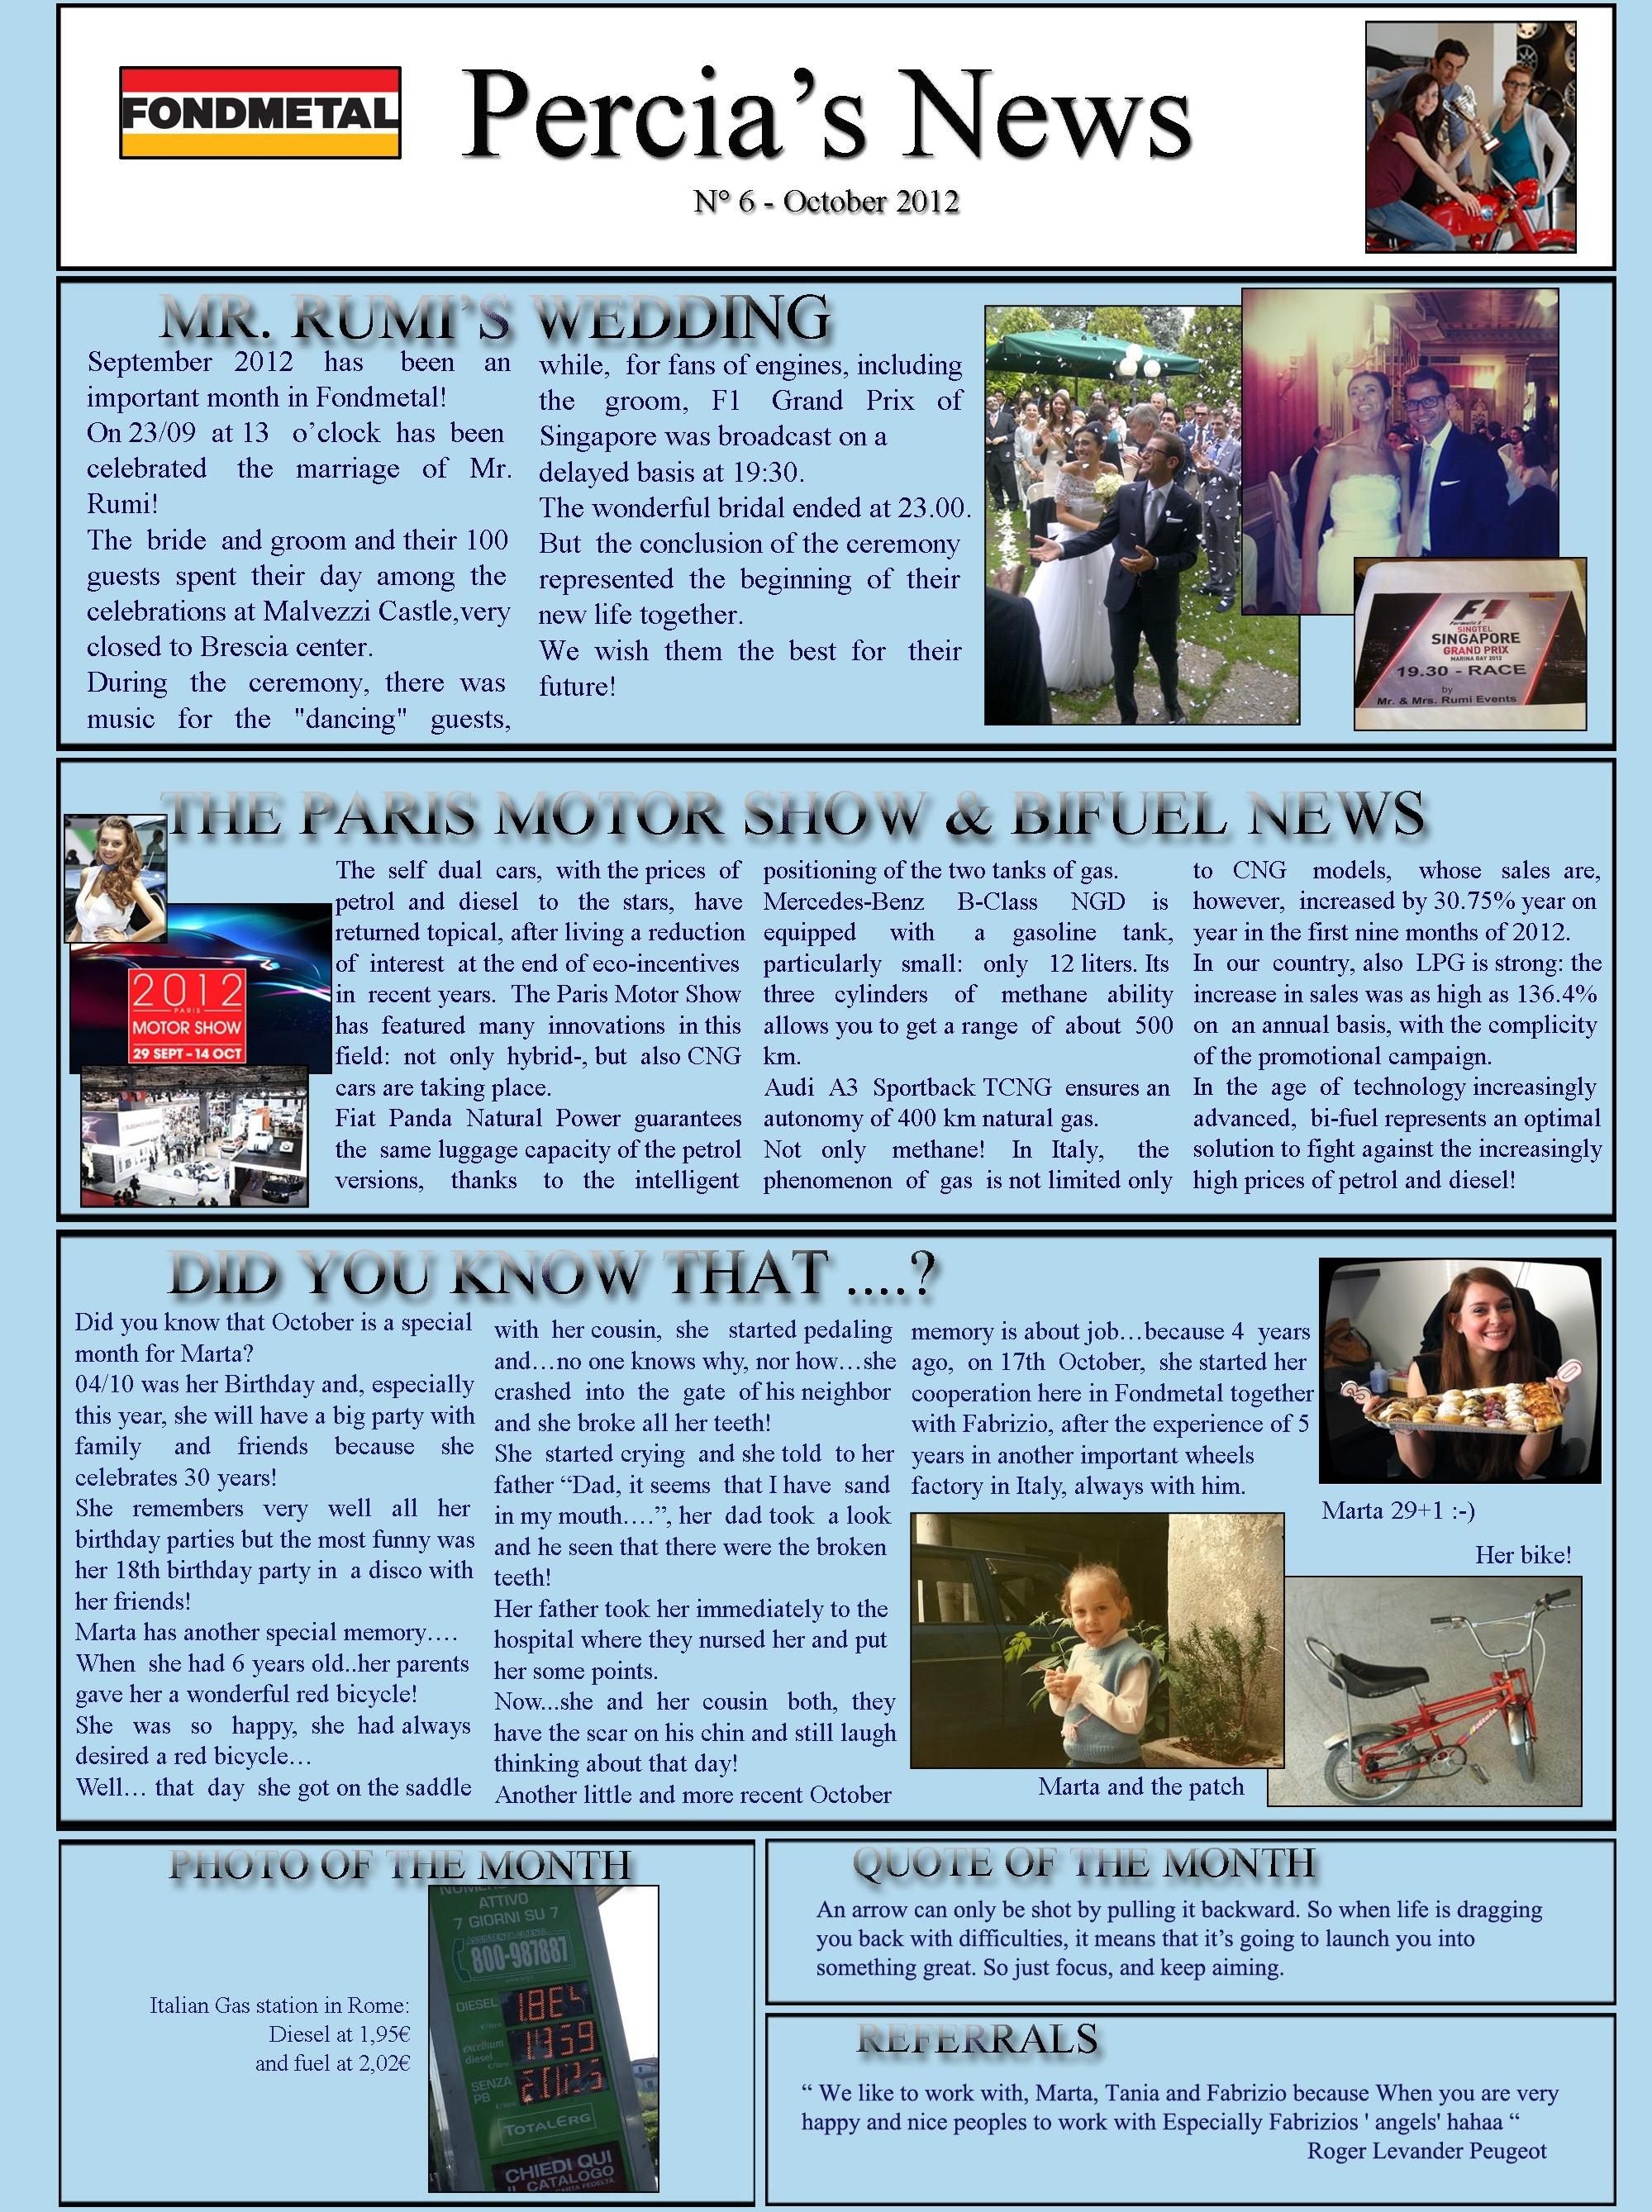 PERCIA'S NEWS OCTOBER 2012